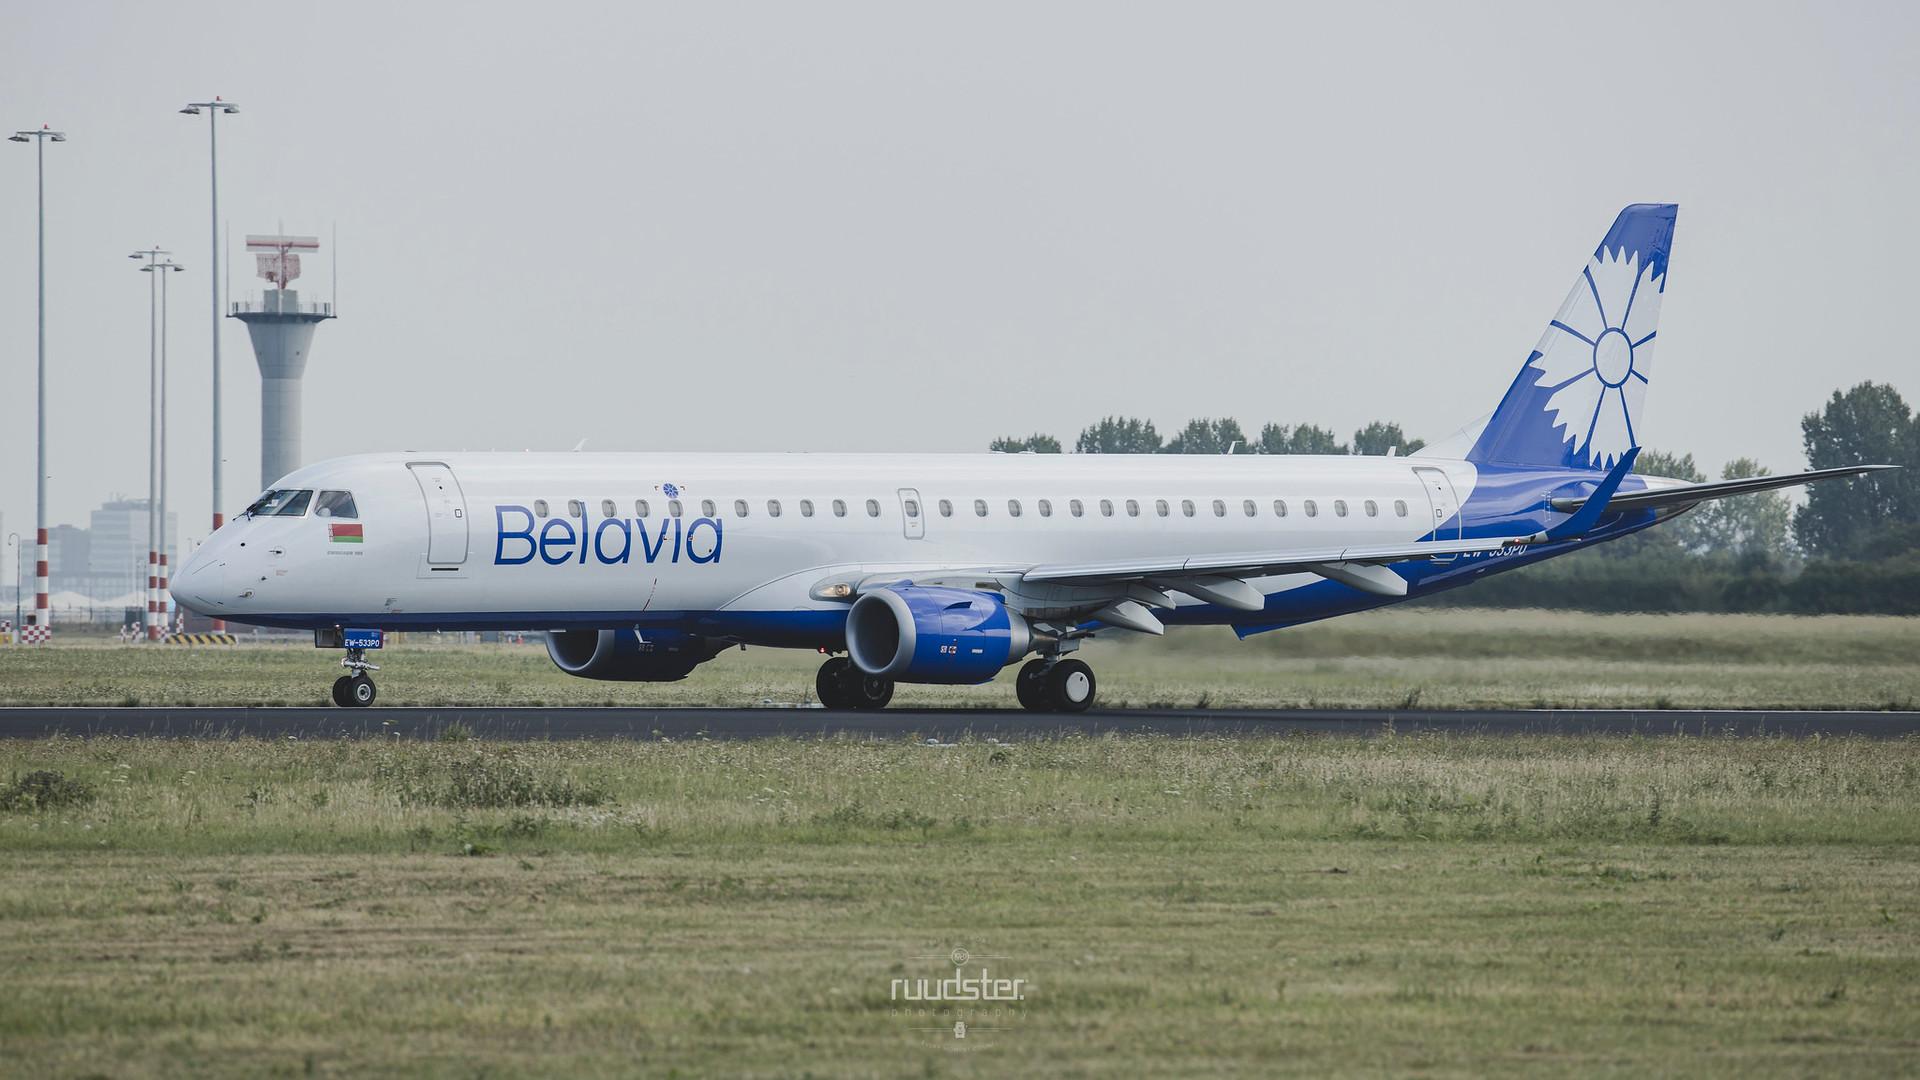 EW-533PO | Build: 2019 - Embraer 195LR